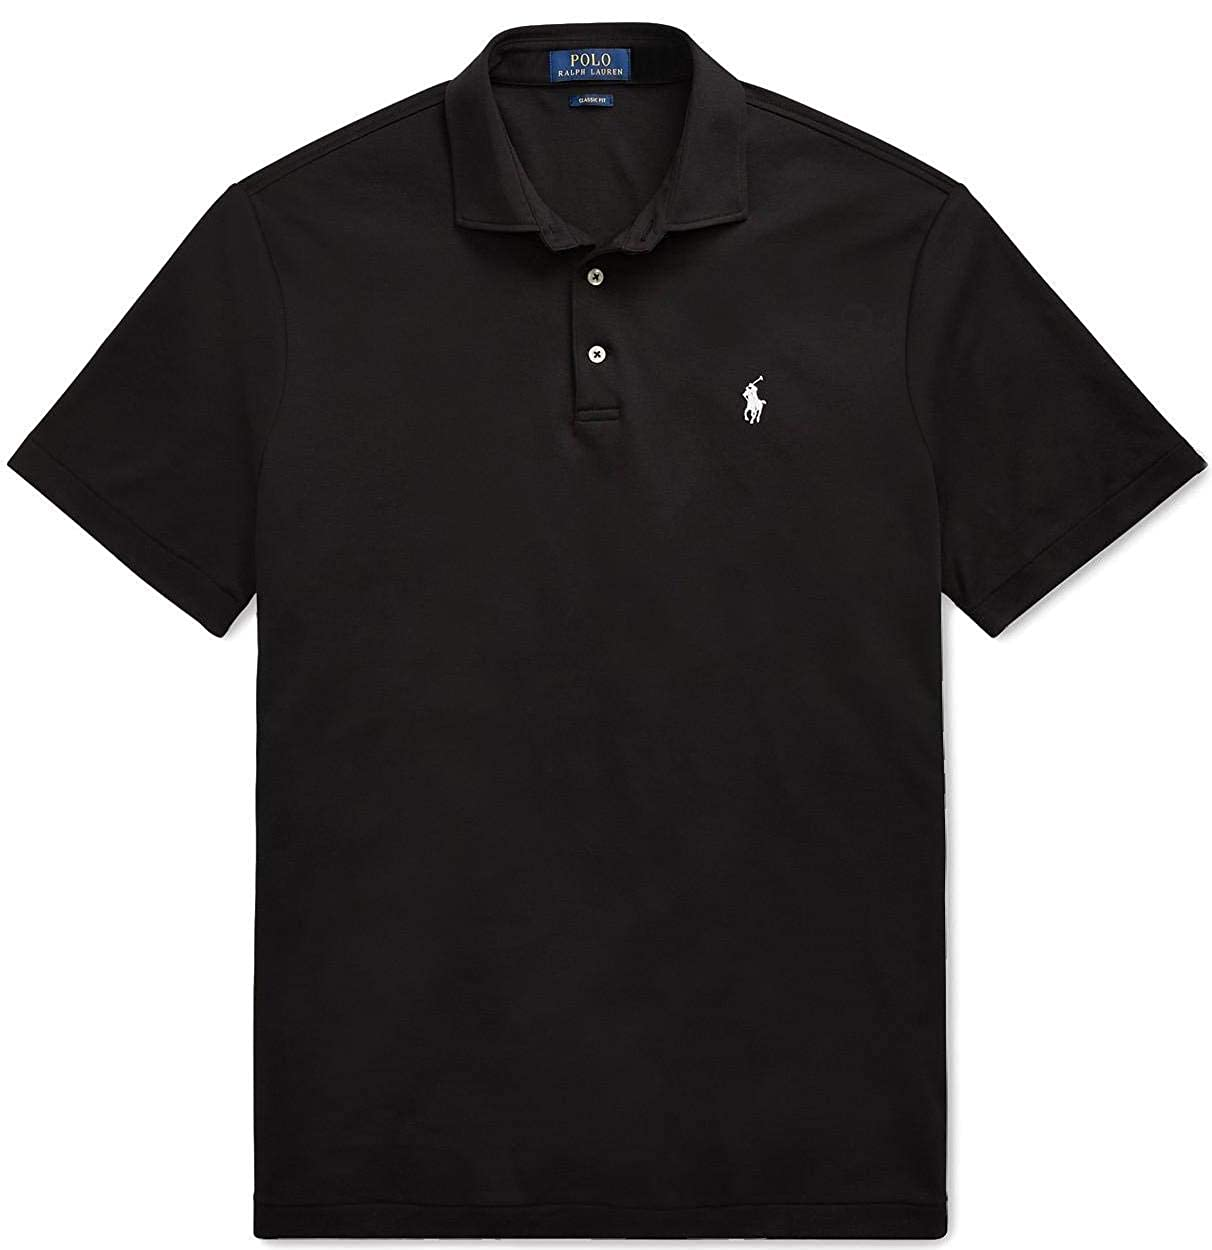 Polo Ralph Lauren Hombres de Media Fit Polo de Enclavamiento Shirt ...